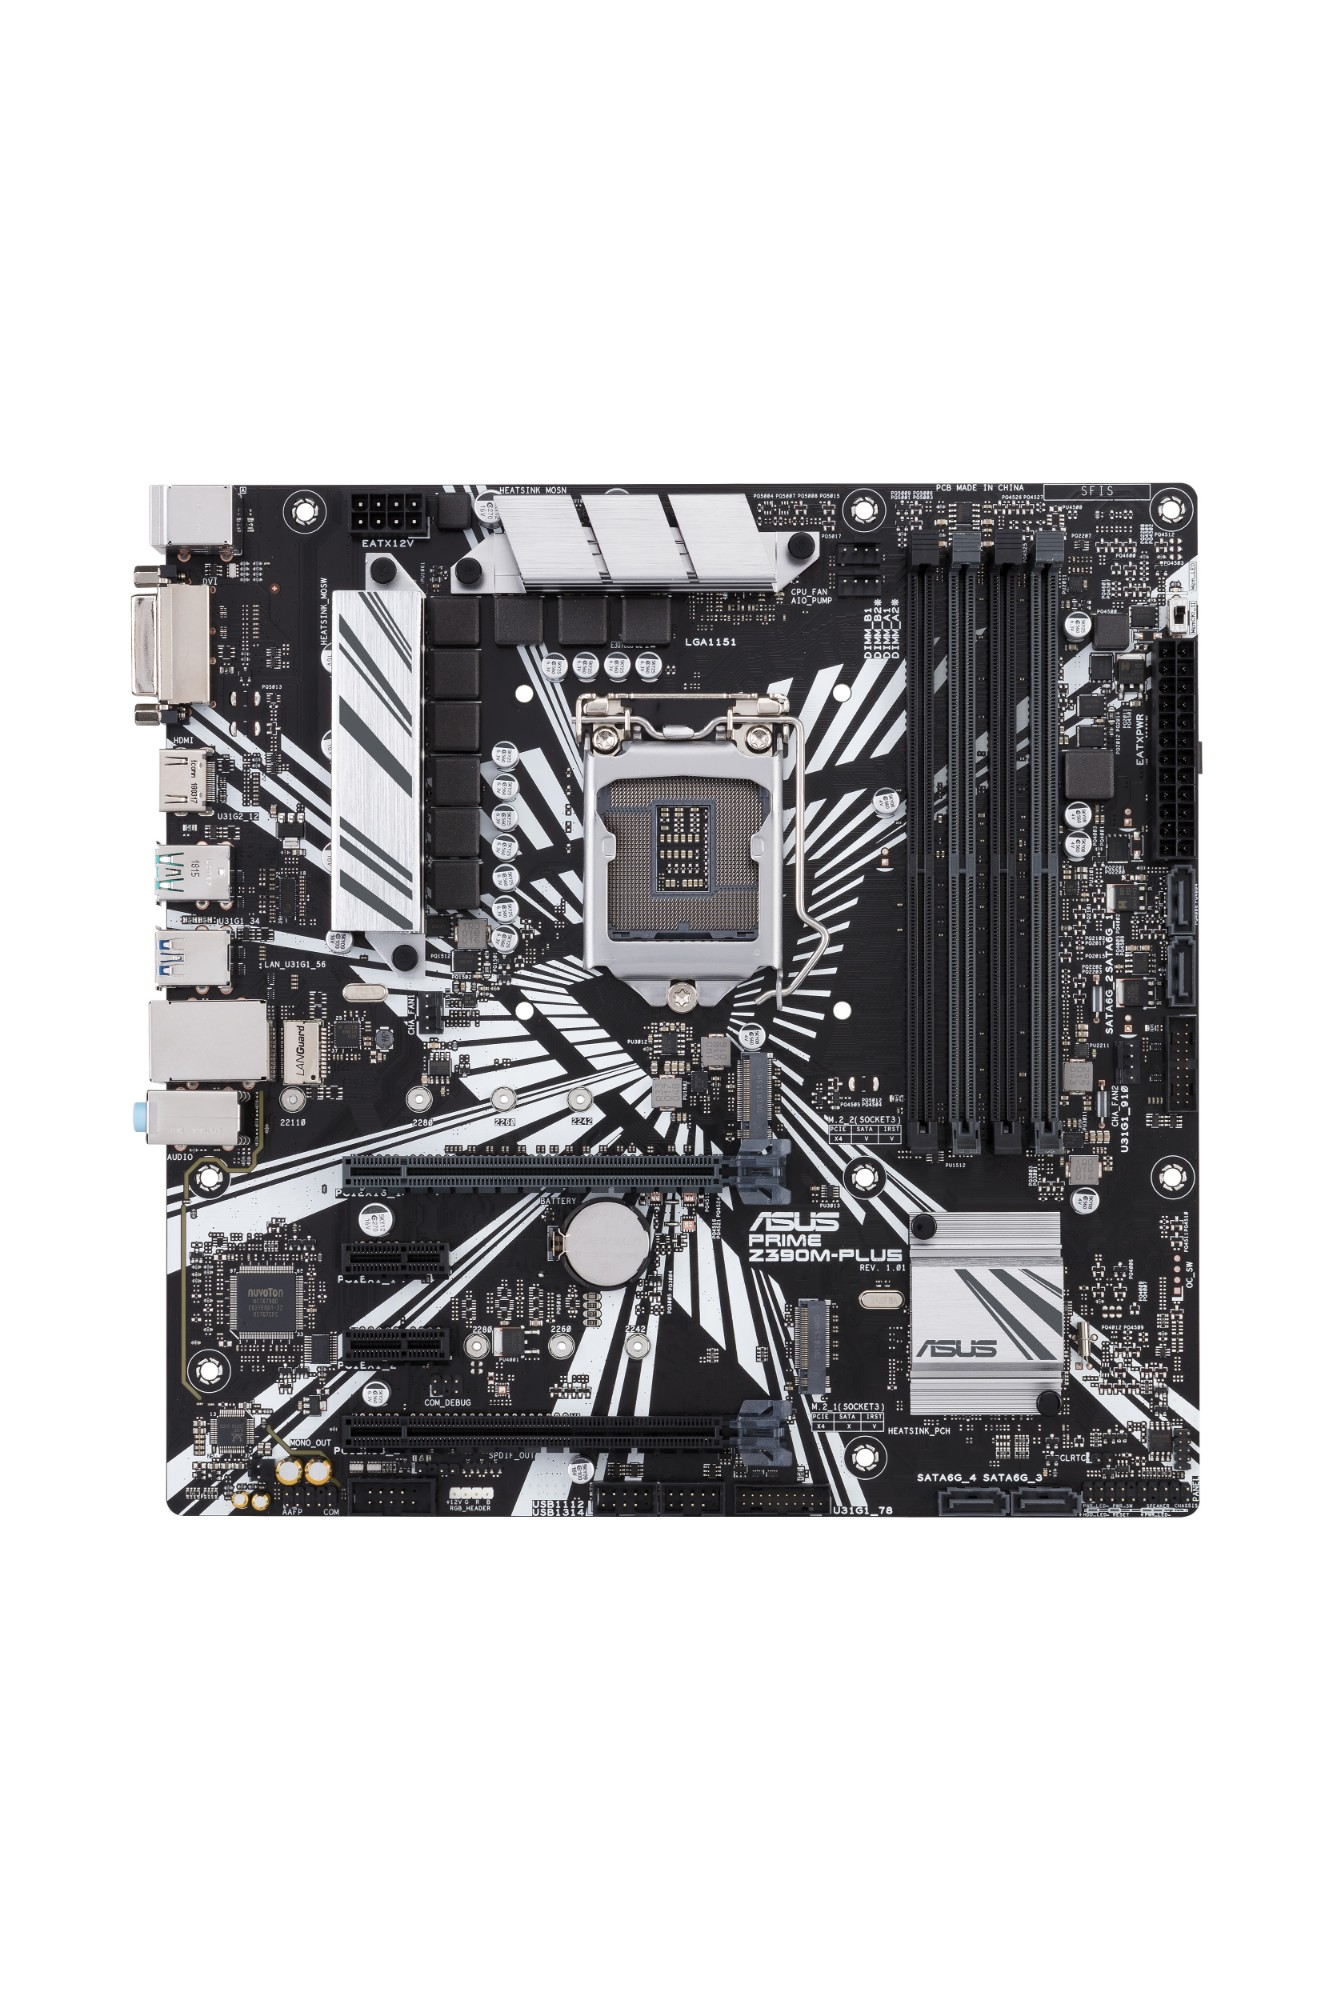 ASUS PRIME Z390M-PLUS LGA 1151 (Socket H4) Intel Z390 micro ATX